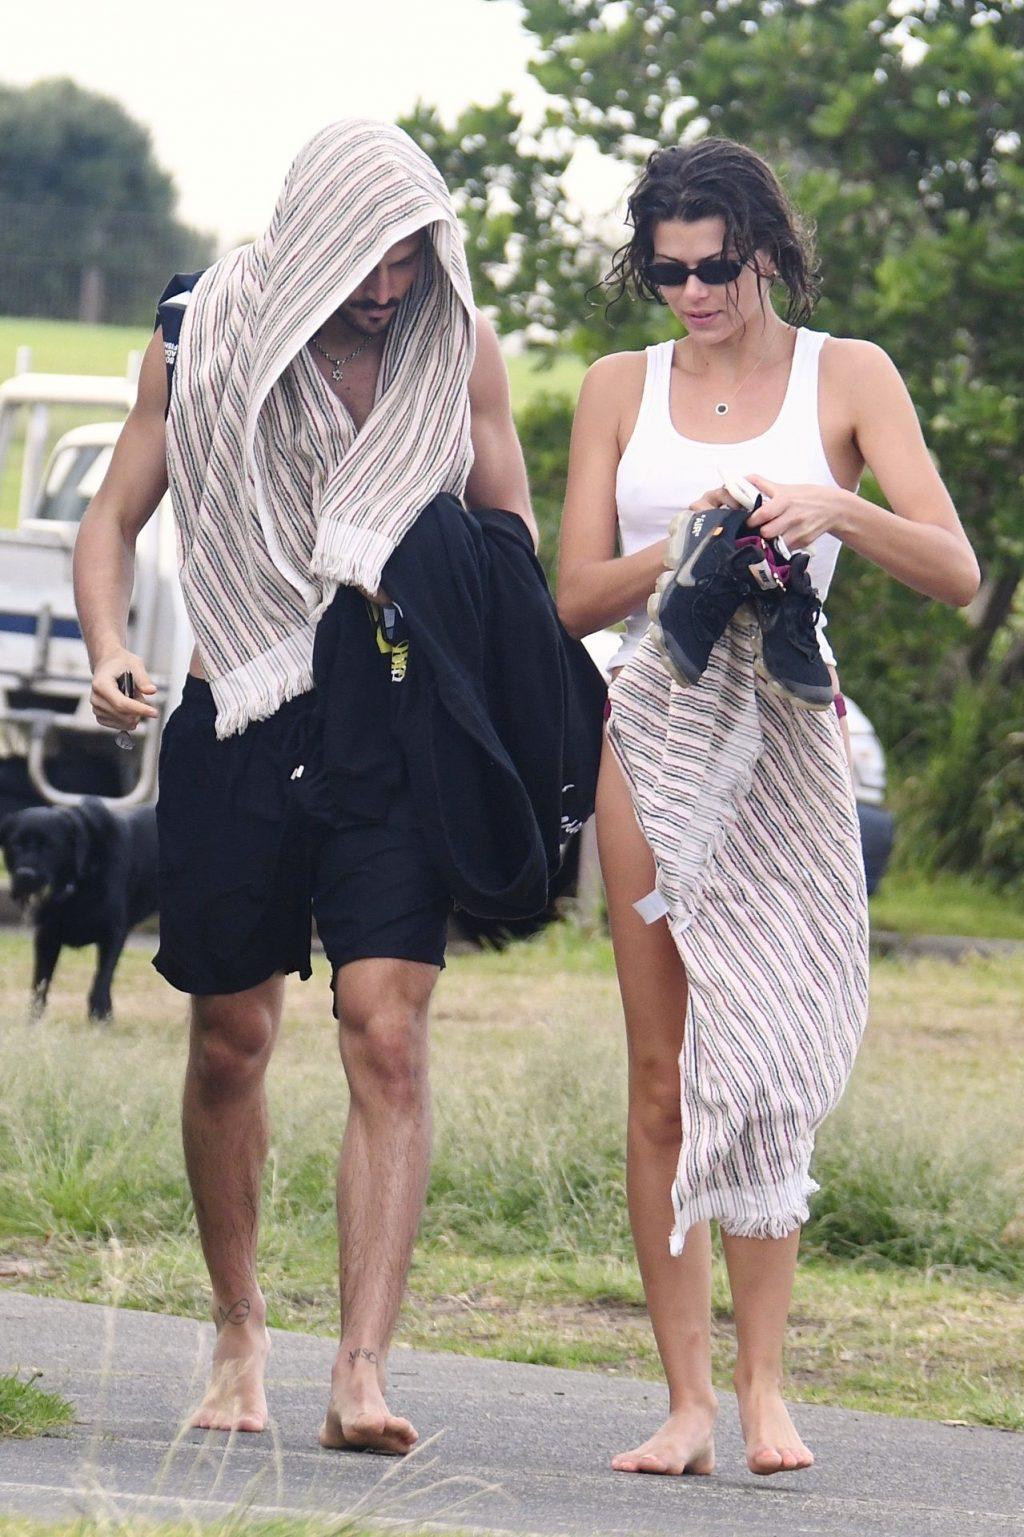 Georgia Fowler & Nathan Dalah Were Seen Walking Home (29 Photos)